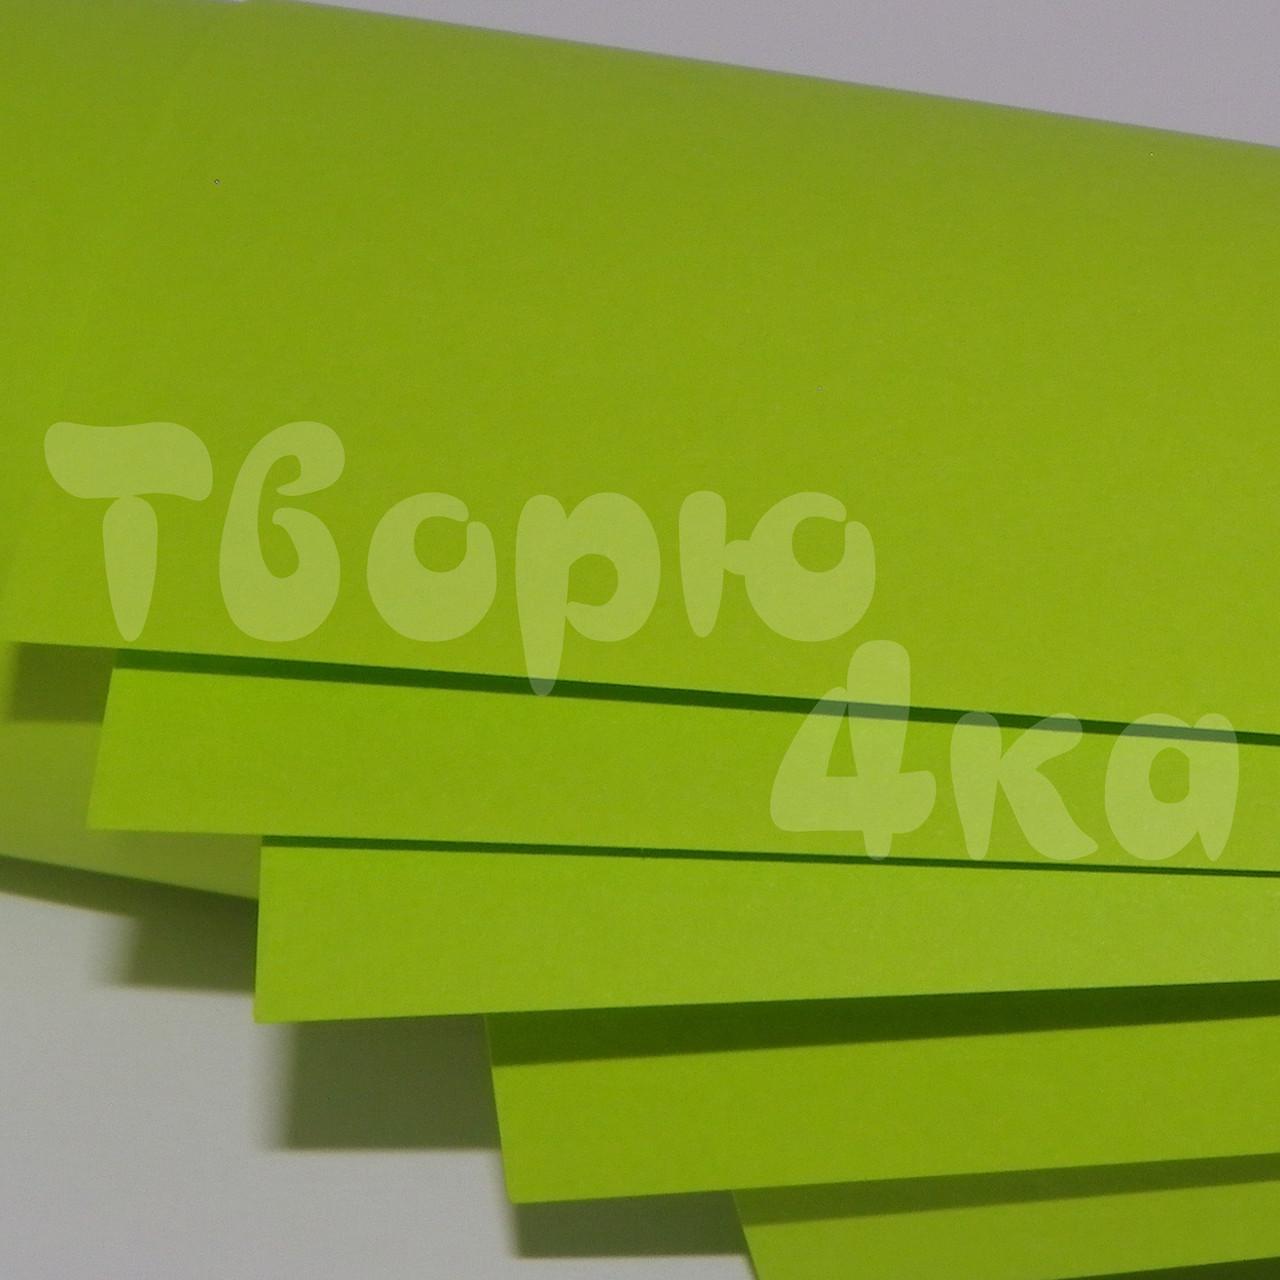 Бумага цветная А3 160 гр/м.кв cyber green (кислотный зеленый)